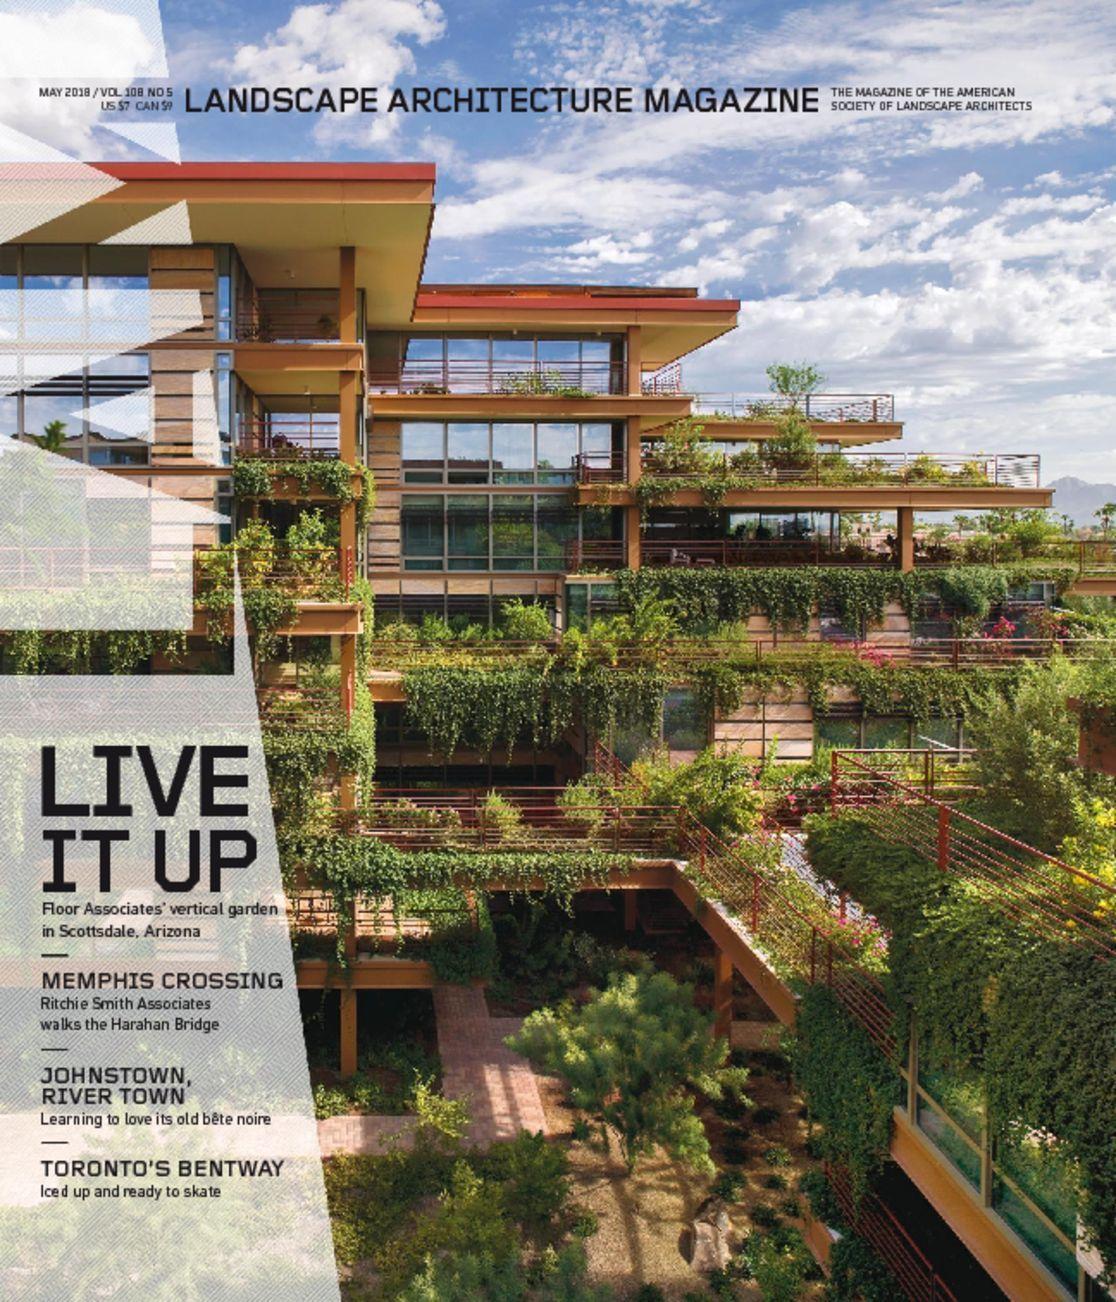 Landscape Architecture Magazine (Digital) - DiscountMags.com